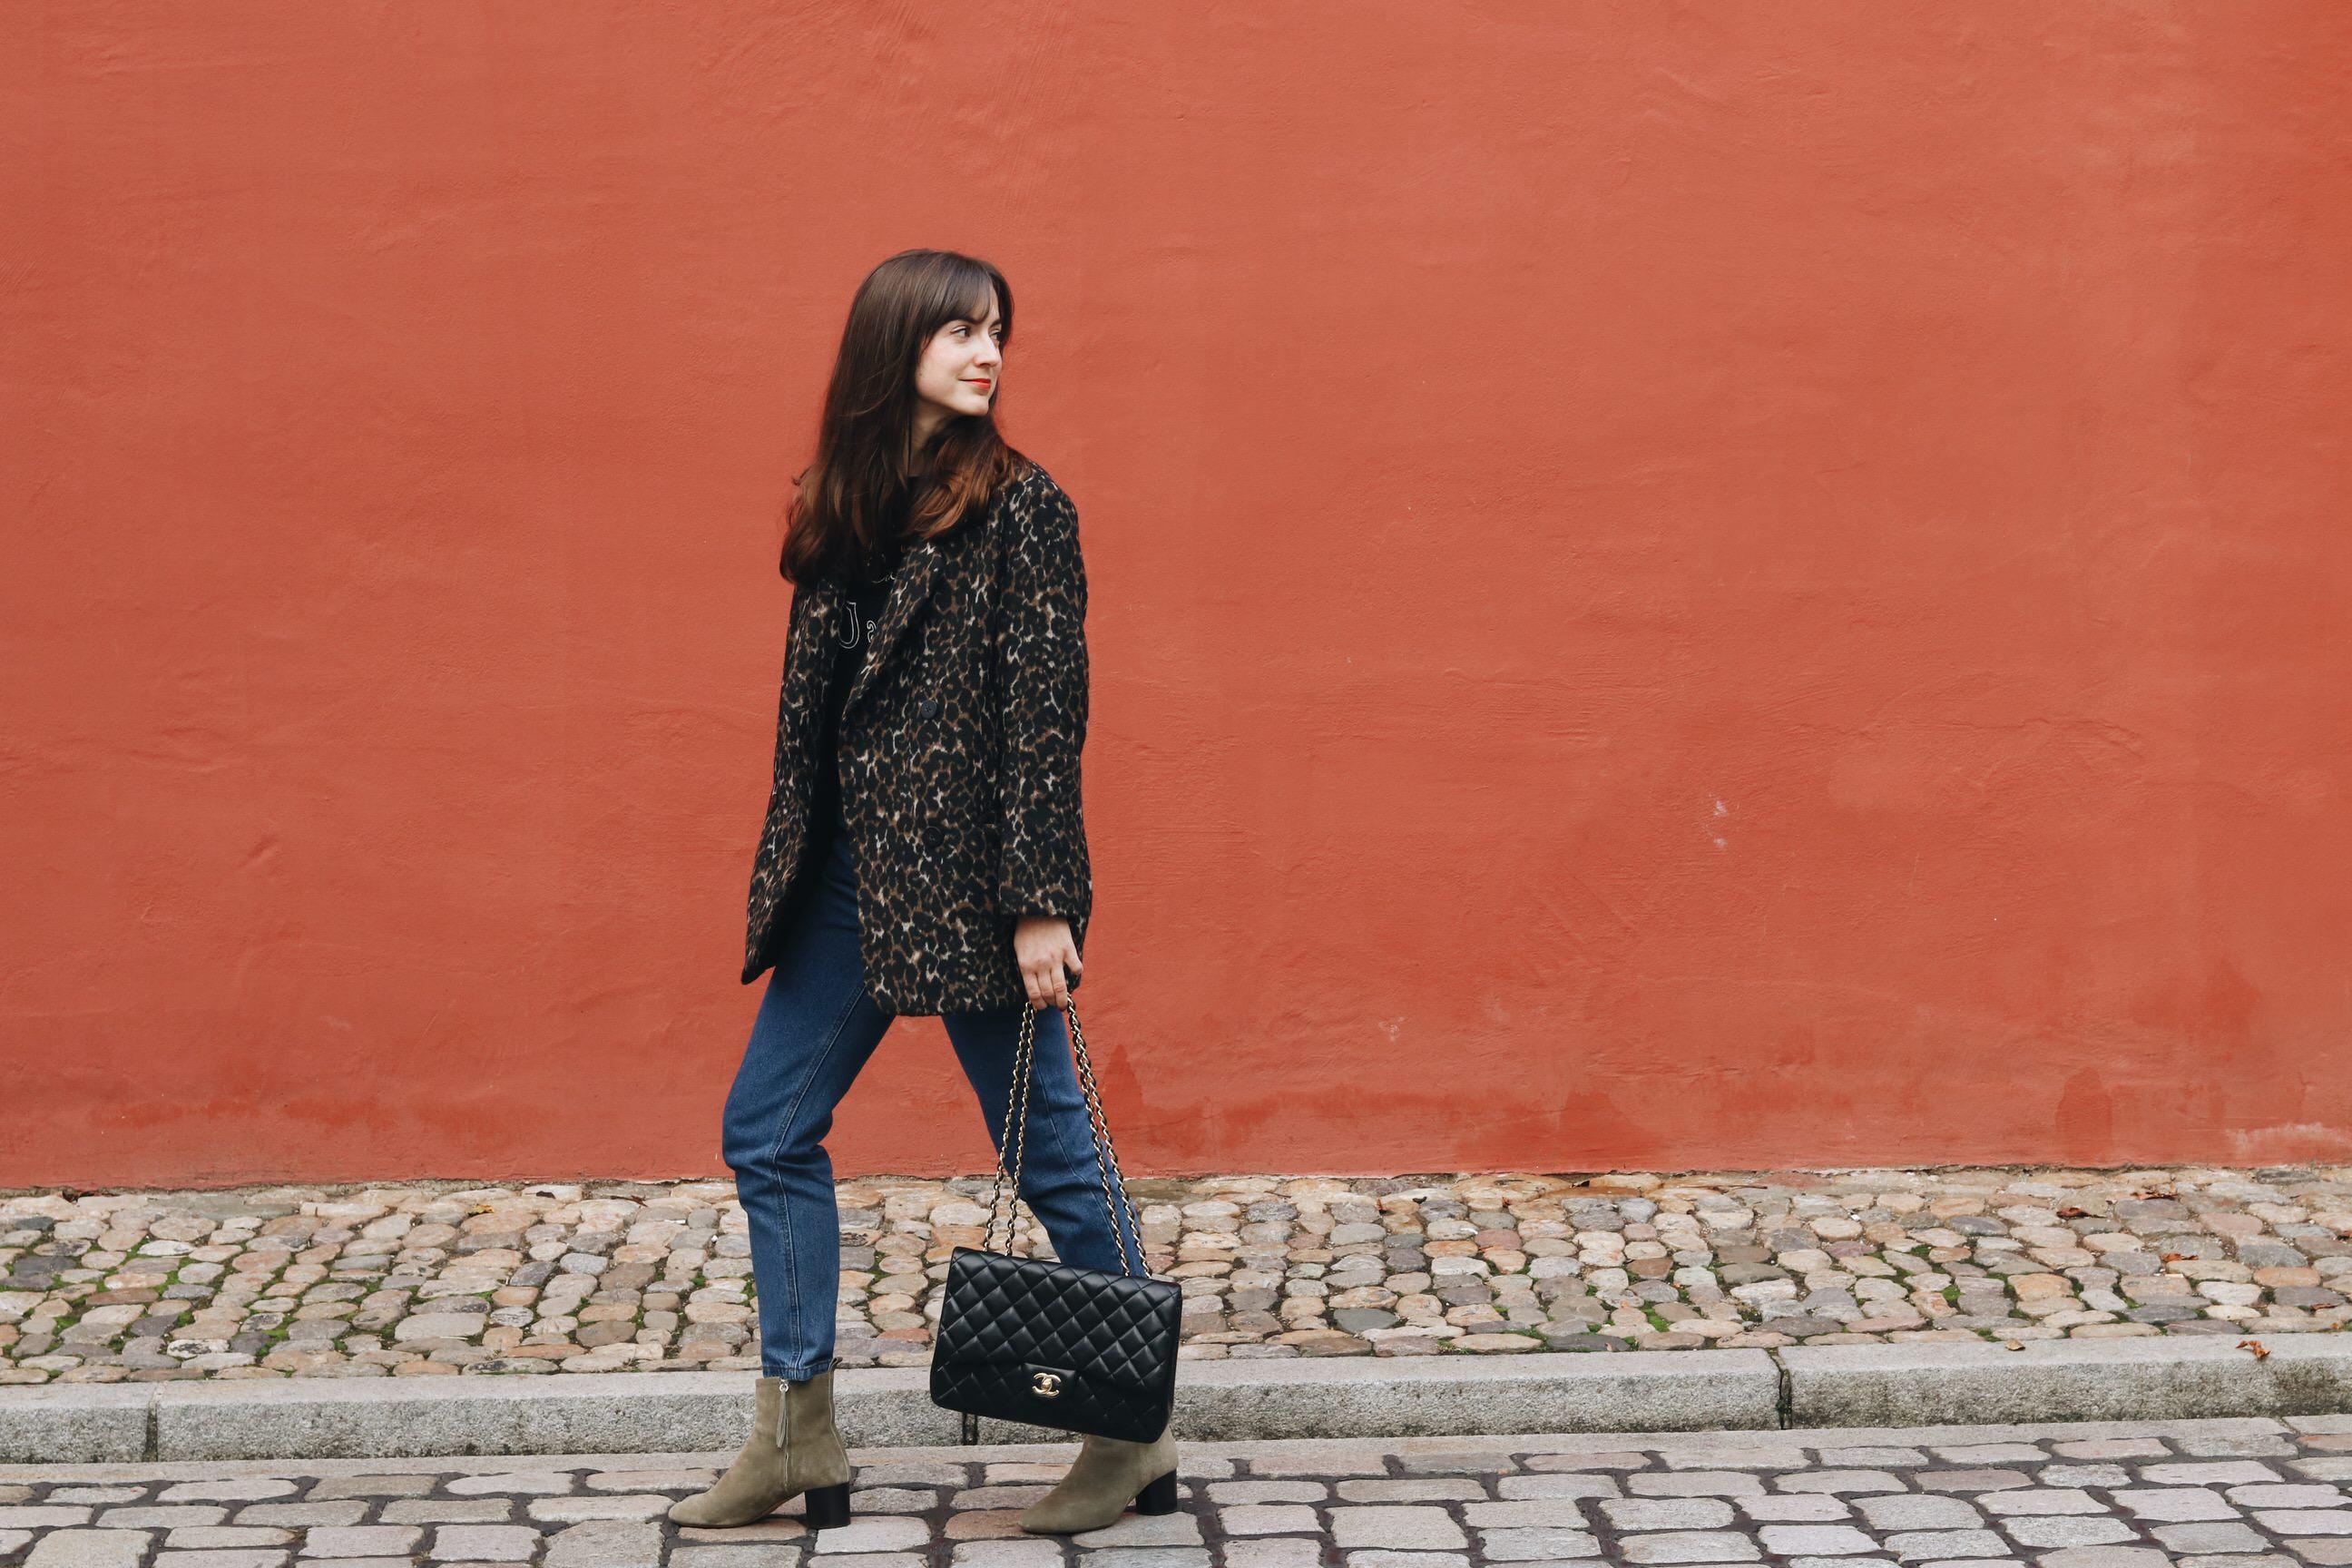 Streetstyle Outfit Blog Bloggerin Neele Leomantel kombinieren mom jeans isabel Marant Booties Chanel Tasche